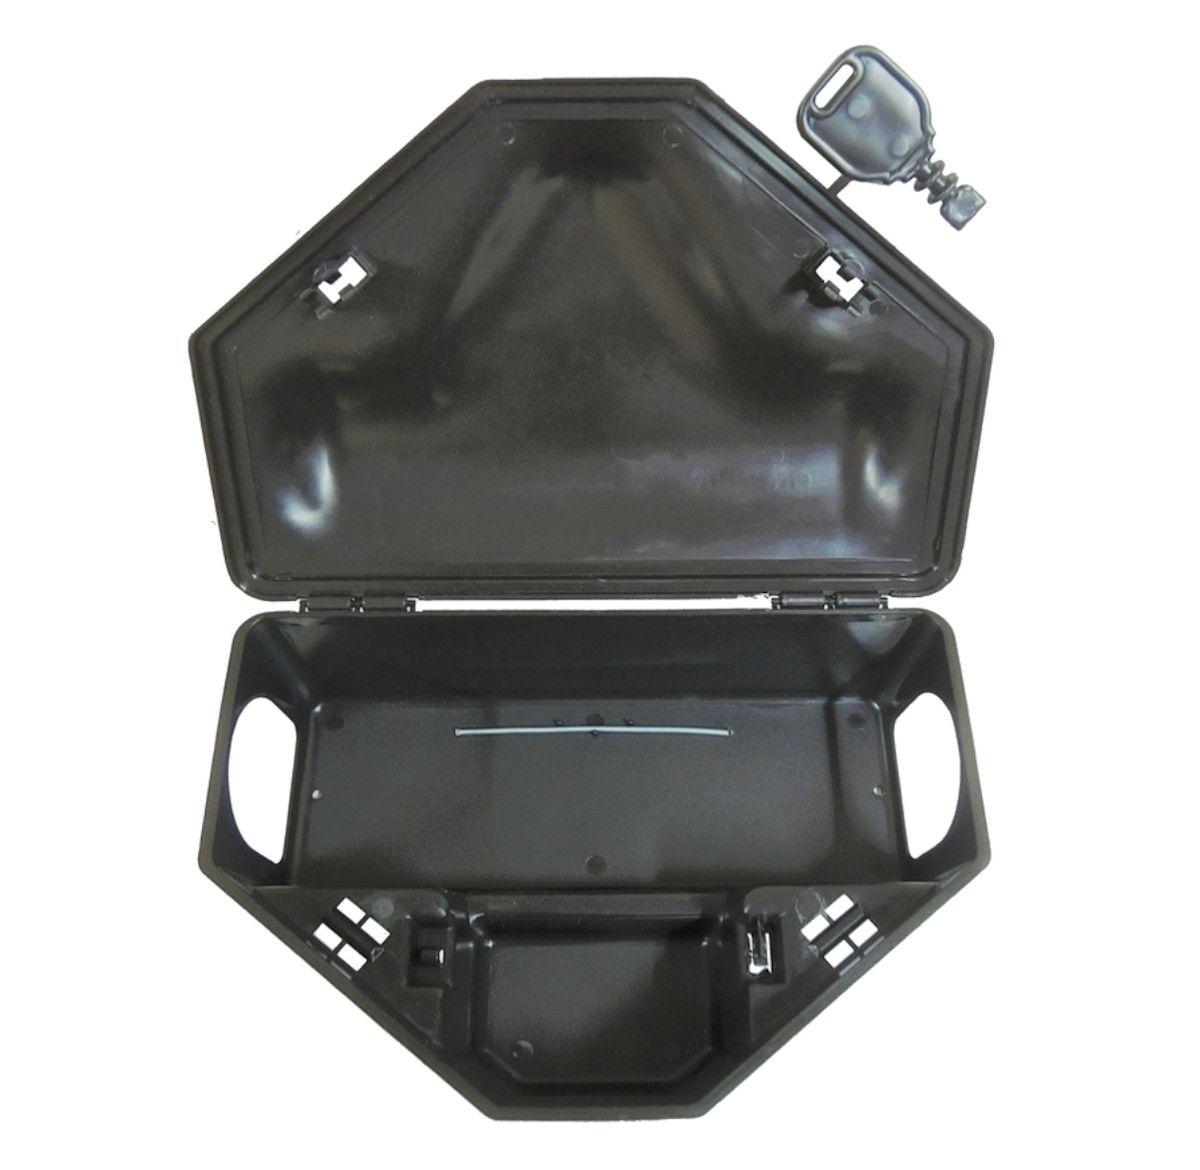 Kit 49 Porta Isca Com 2 Chaves - Duplo Travamento